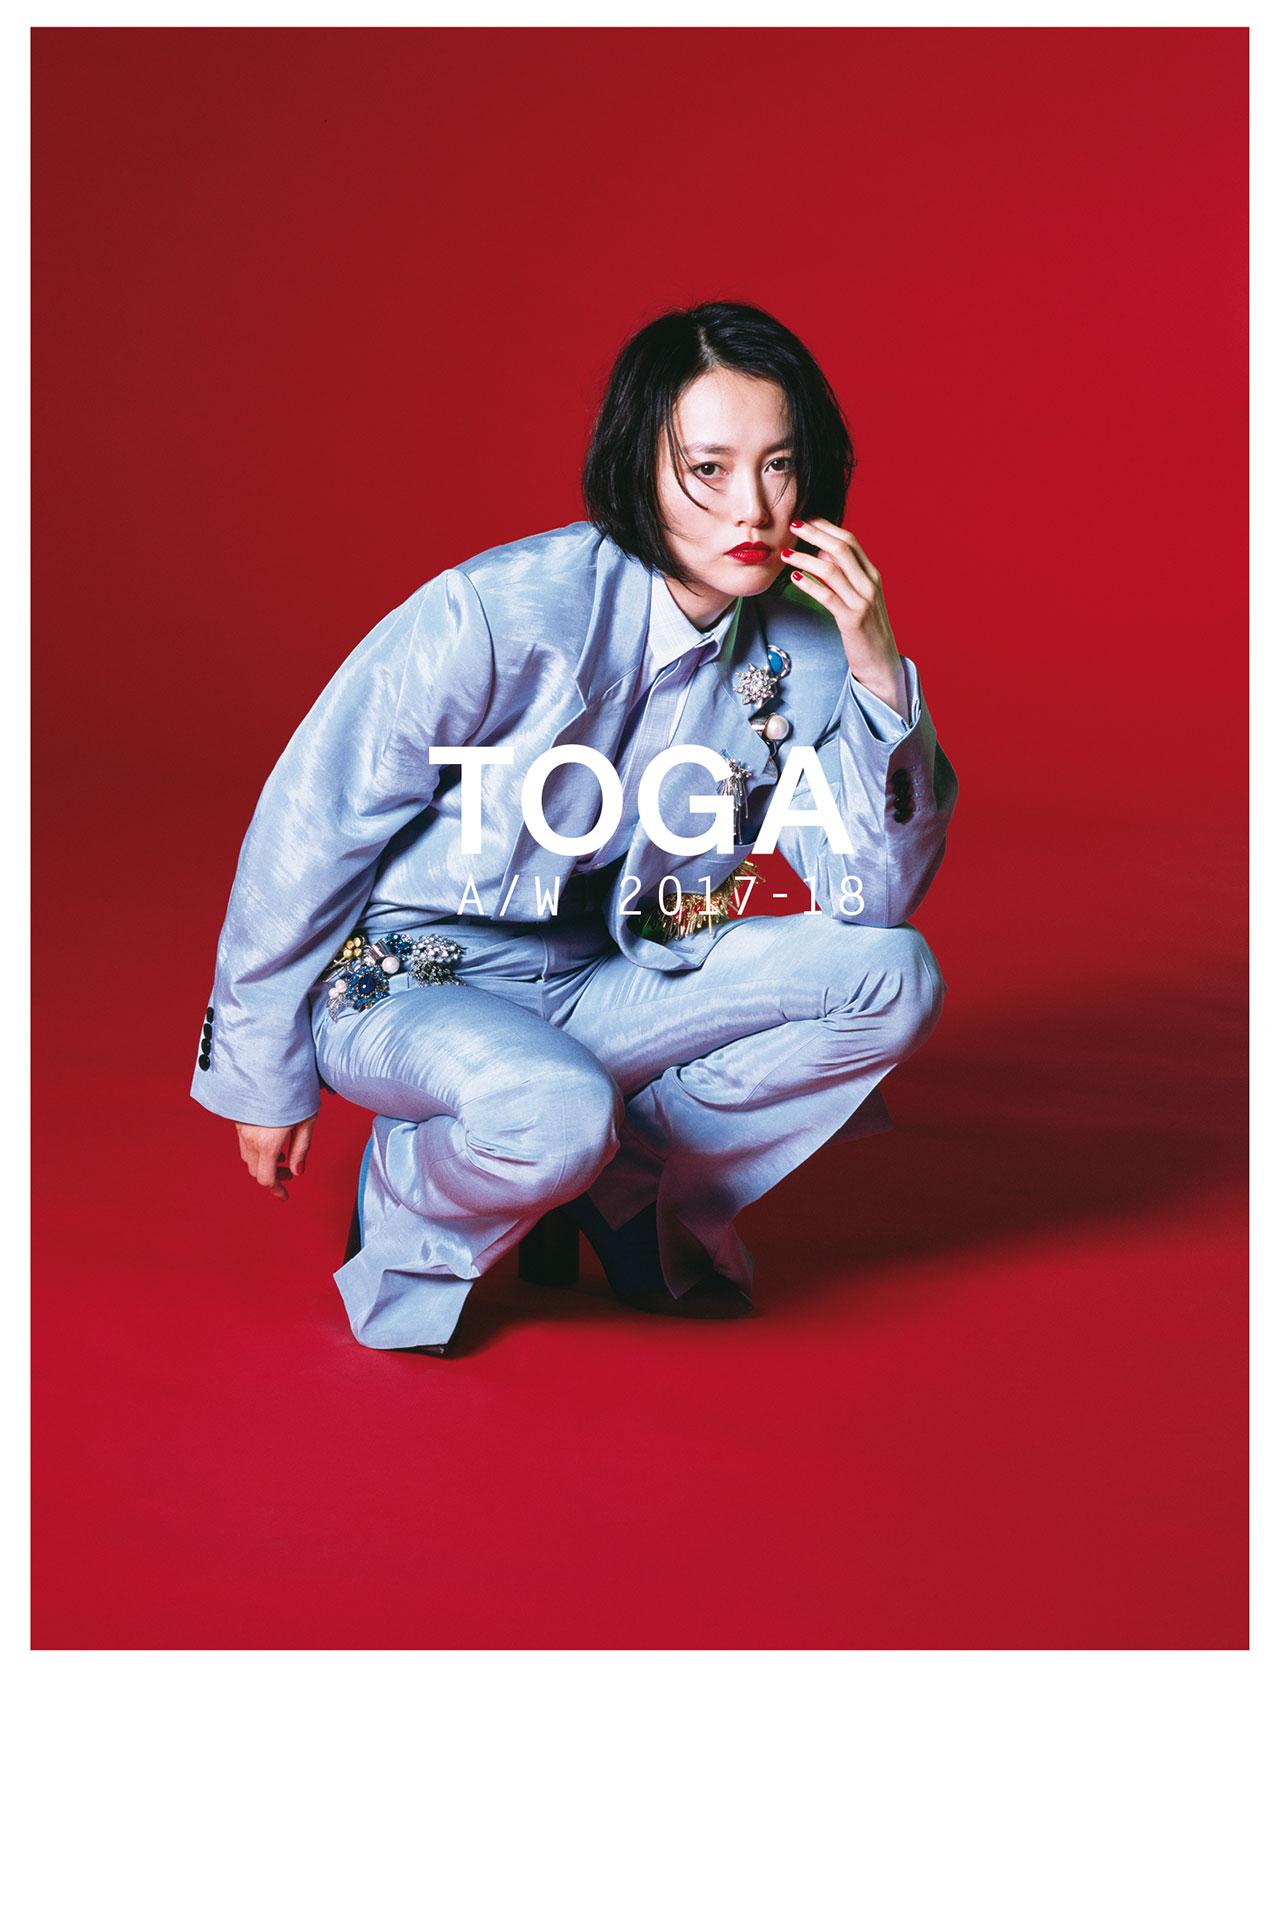 TOGA 2017-18 A/W Campaign